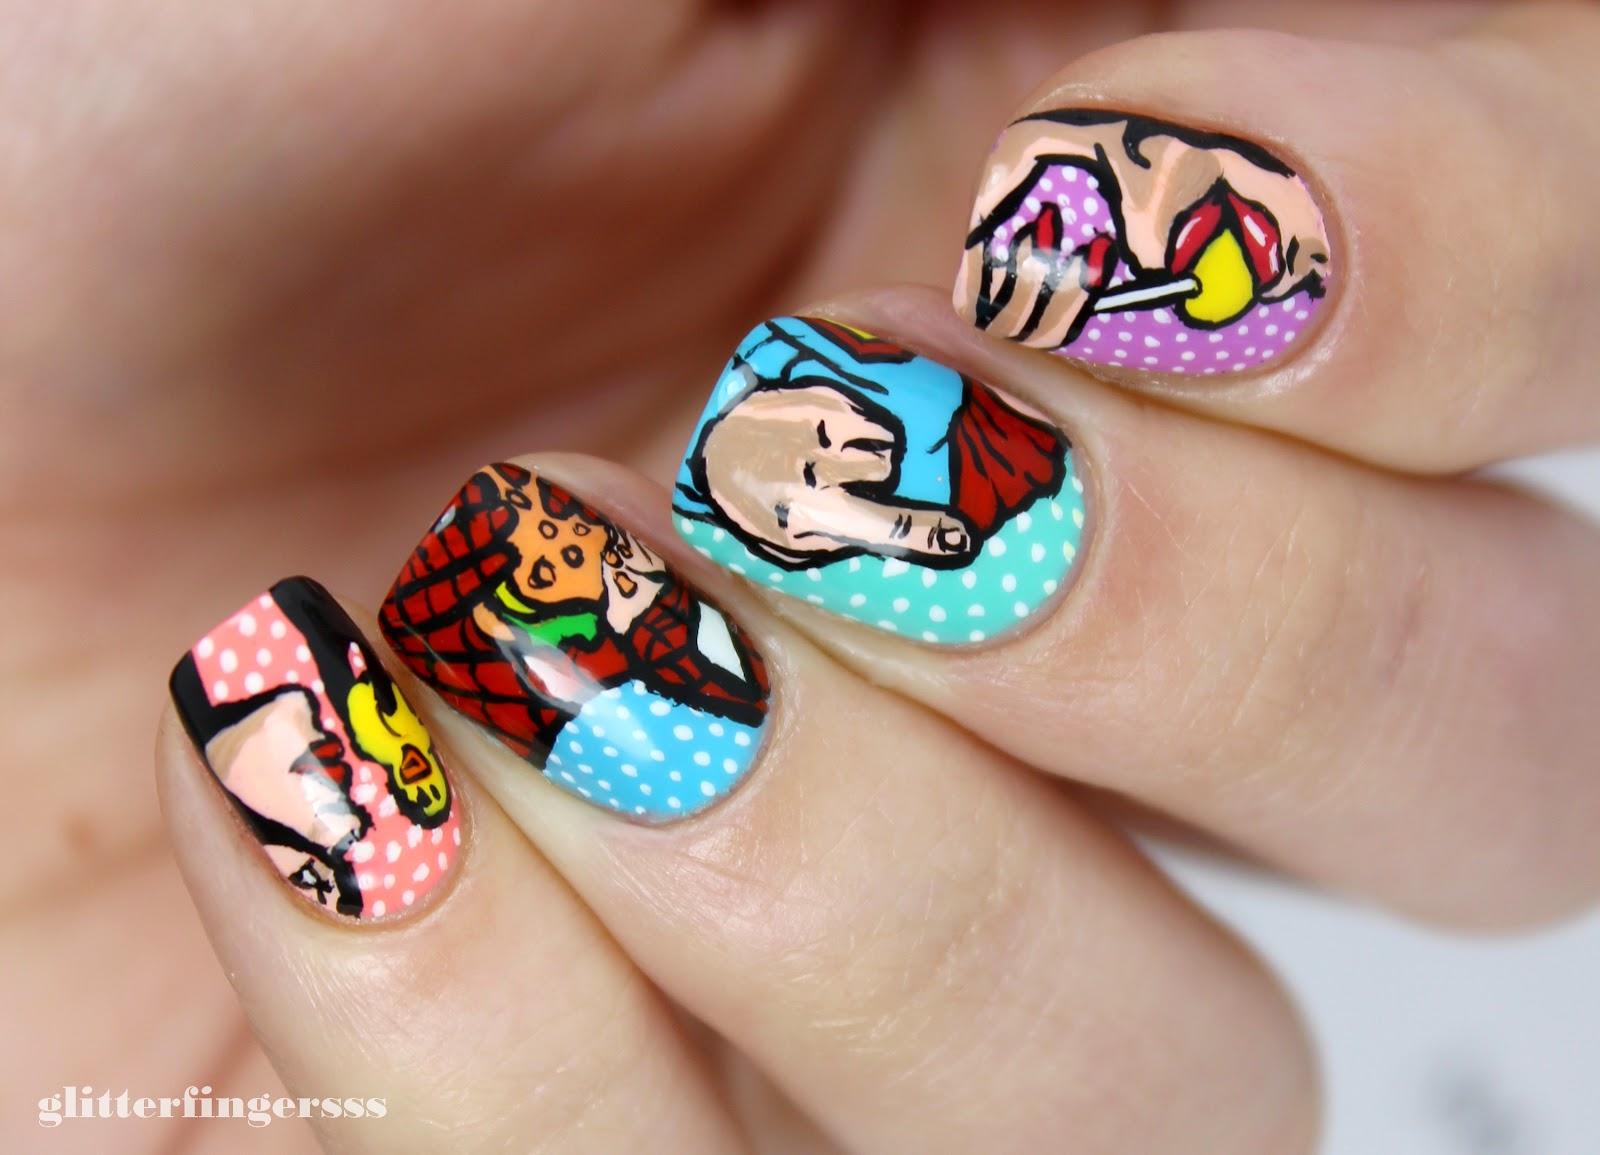 Nail Art Funny Superhero Pop Art Glitterfingersss In English